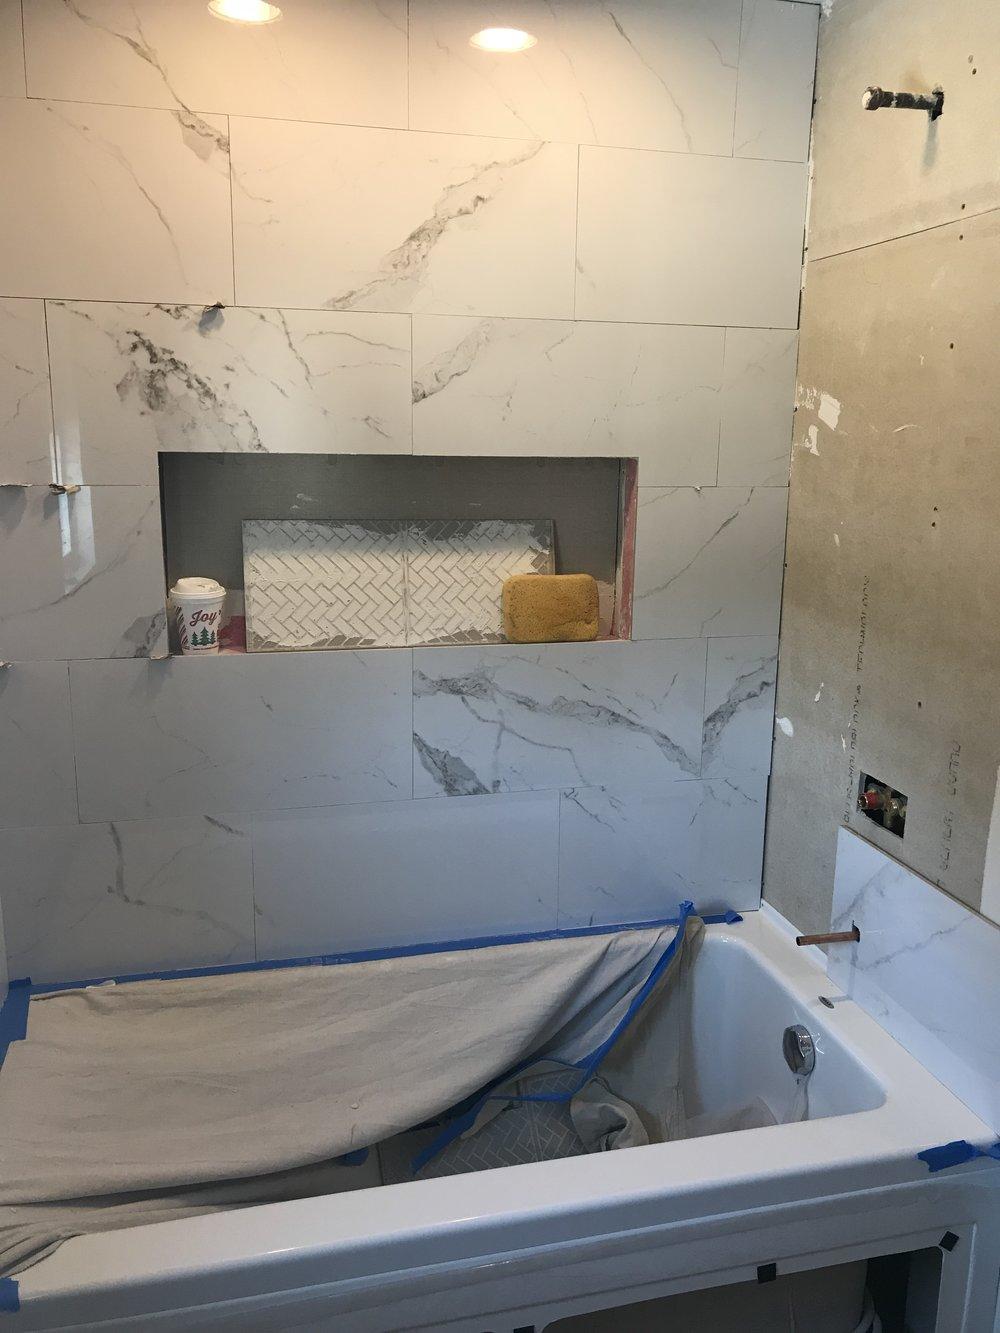 Shaw Remodeling - Bathroom Remodel in Old Lyme CT